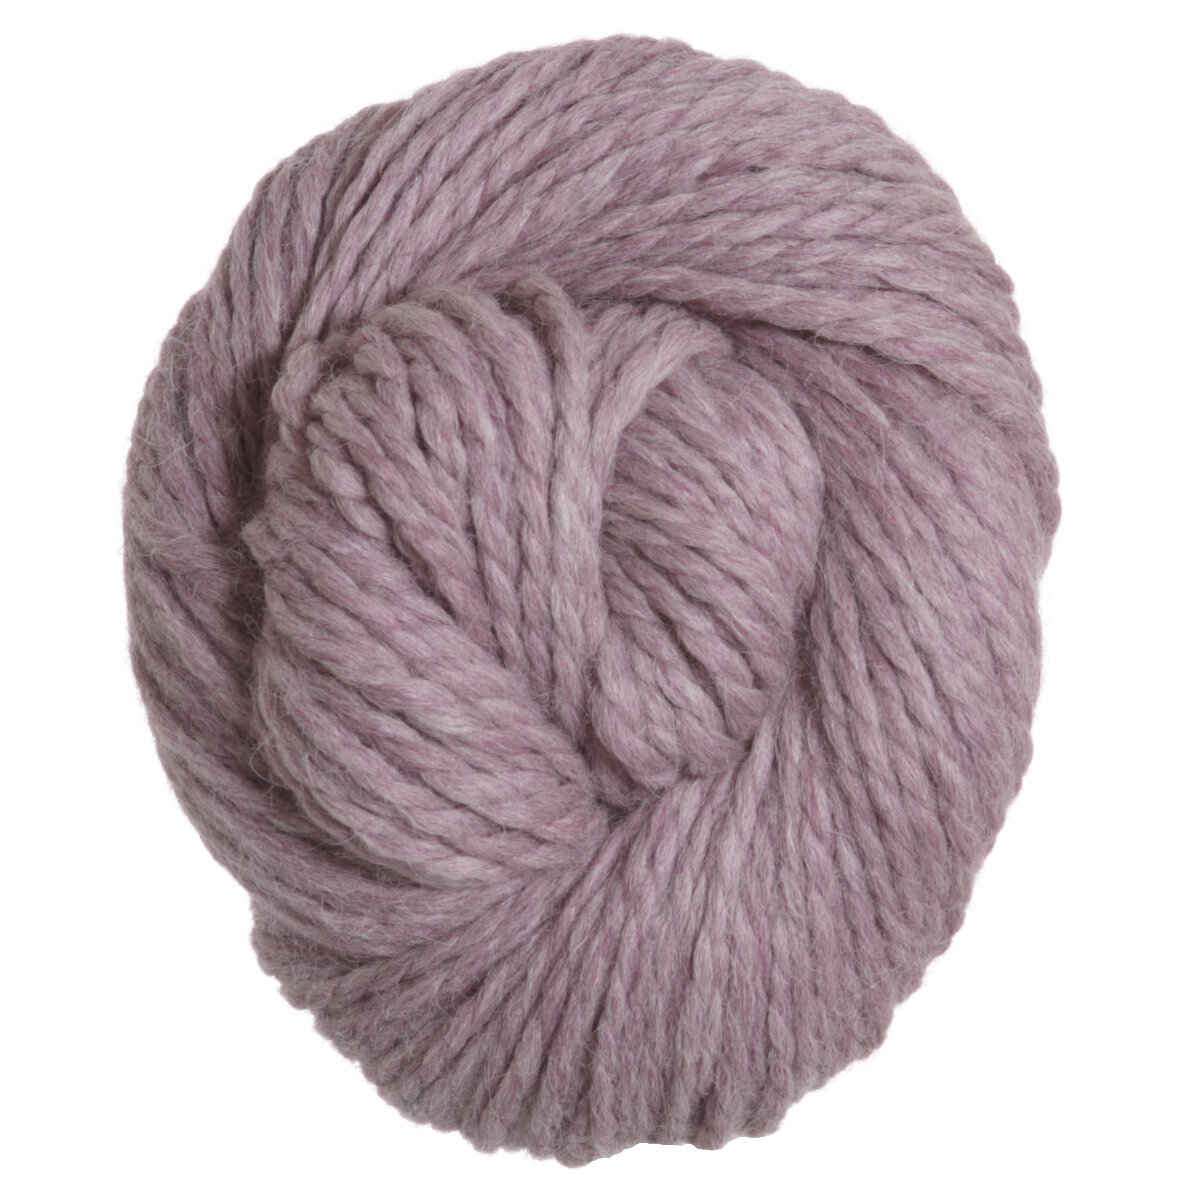 Plymouth Yarn Baby Alpaca Grande Yarn 7718 Pink Heather